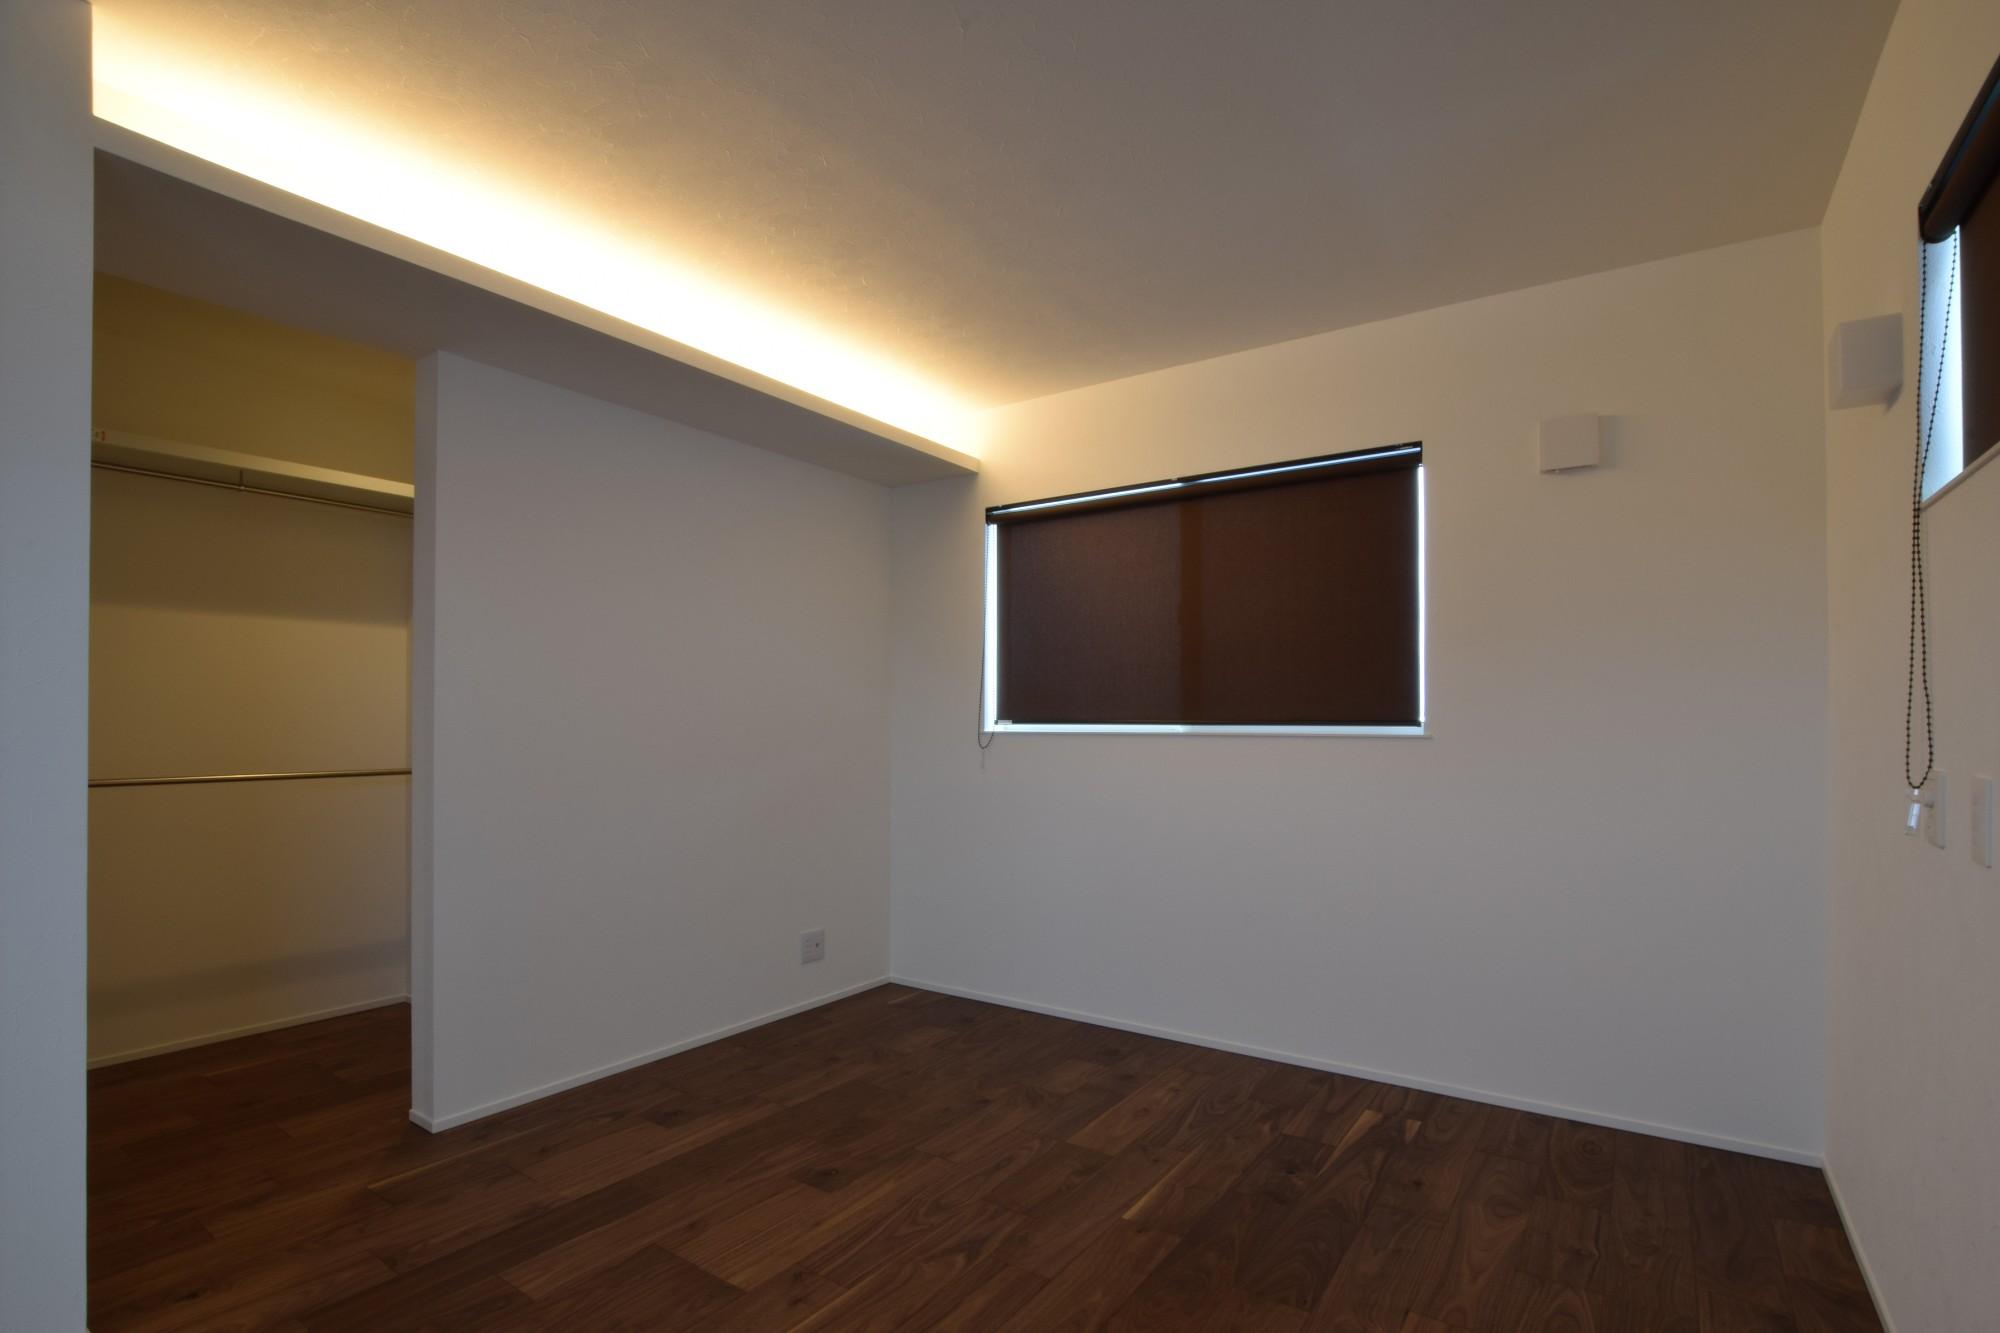 DETAIL HOME(ディテールホーム)「おうち時間を大切にした住まい」のシンプル・ナチュラルな居室の実例写真